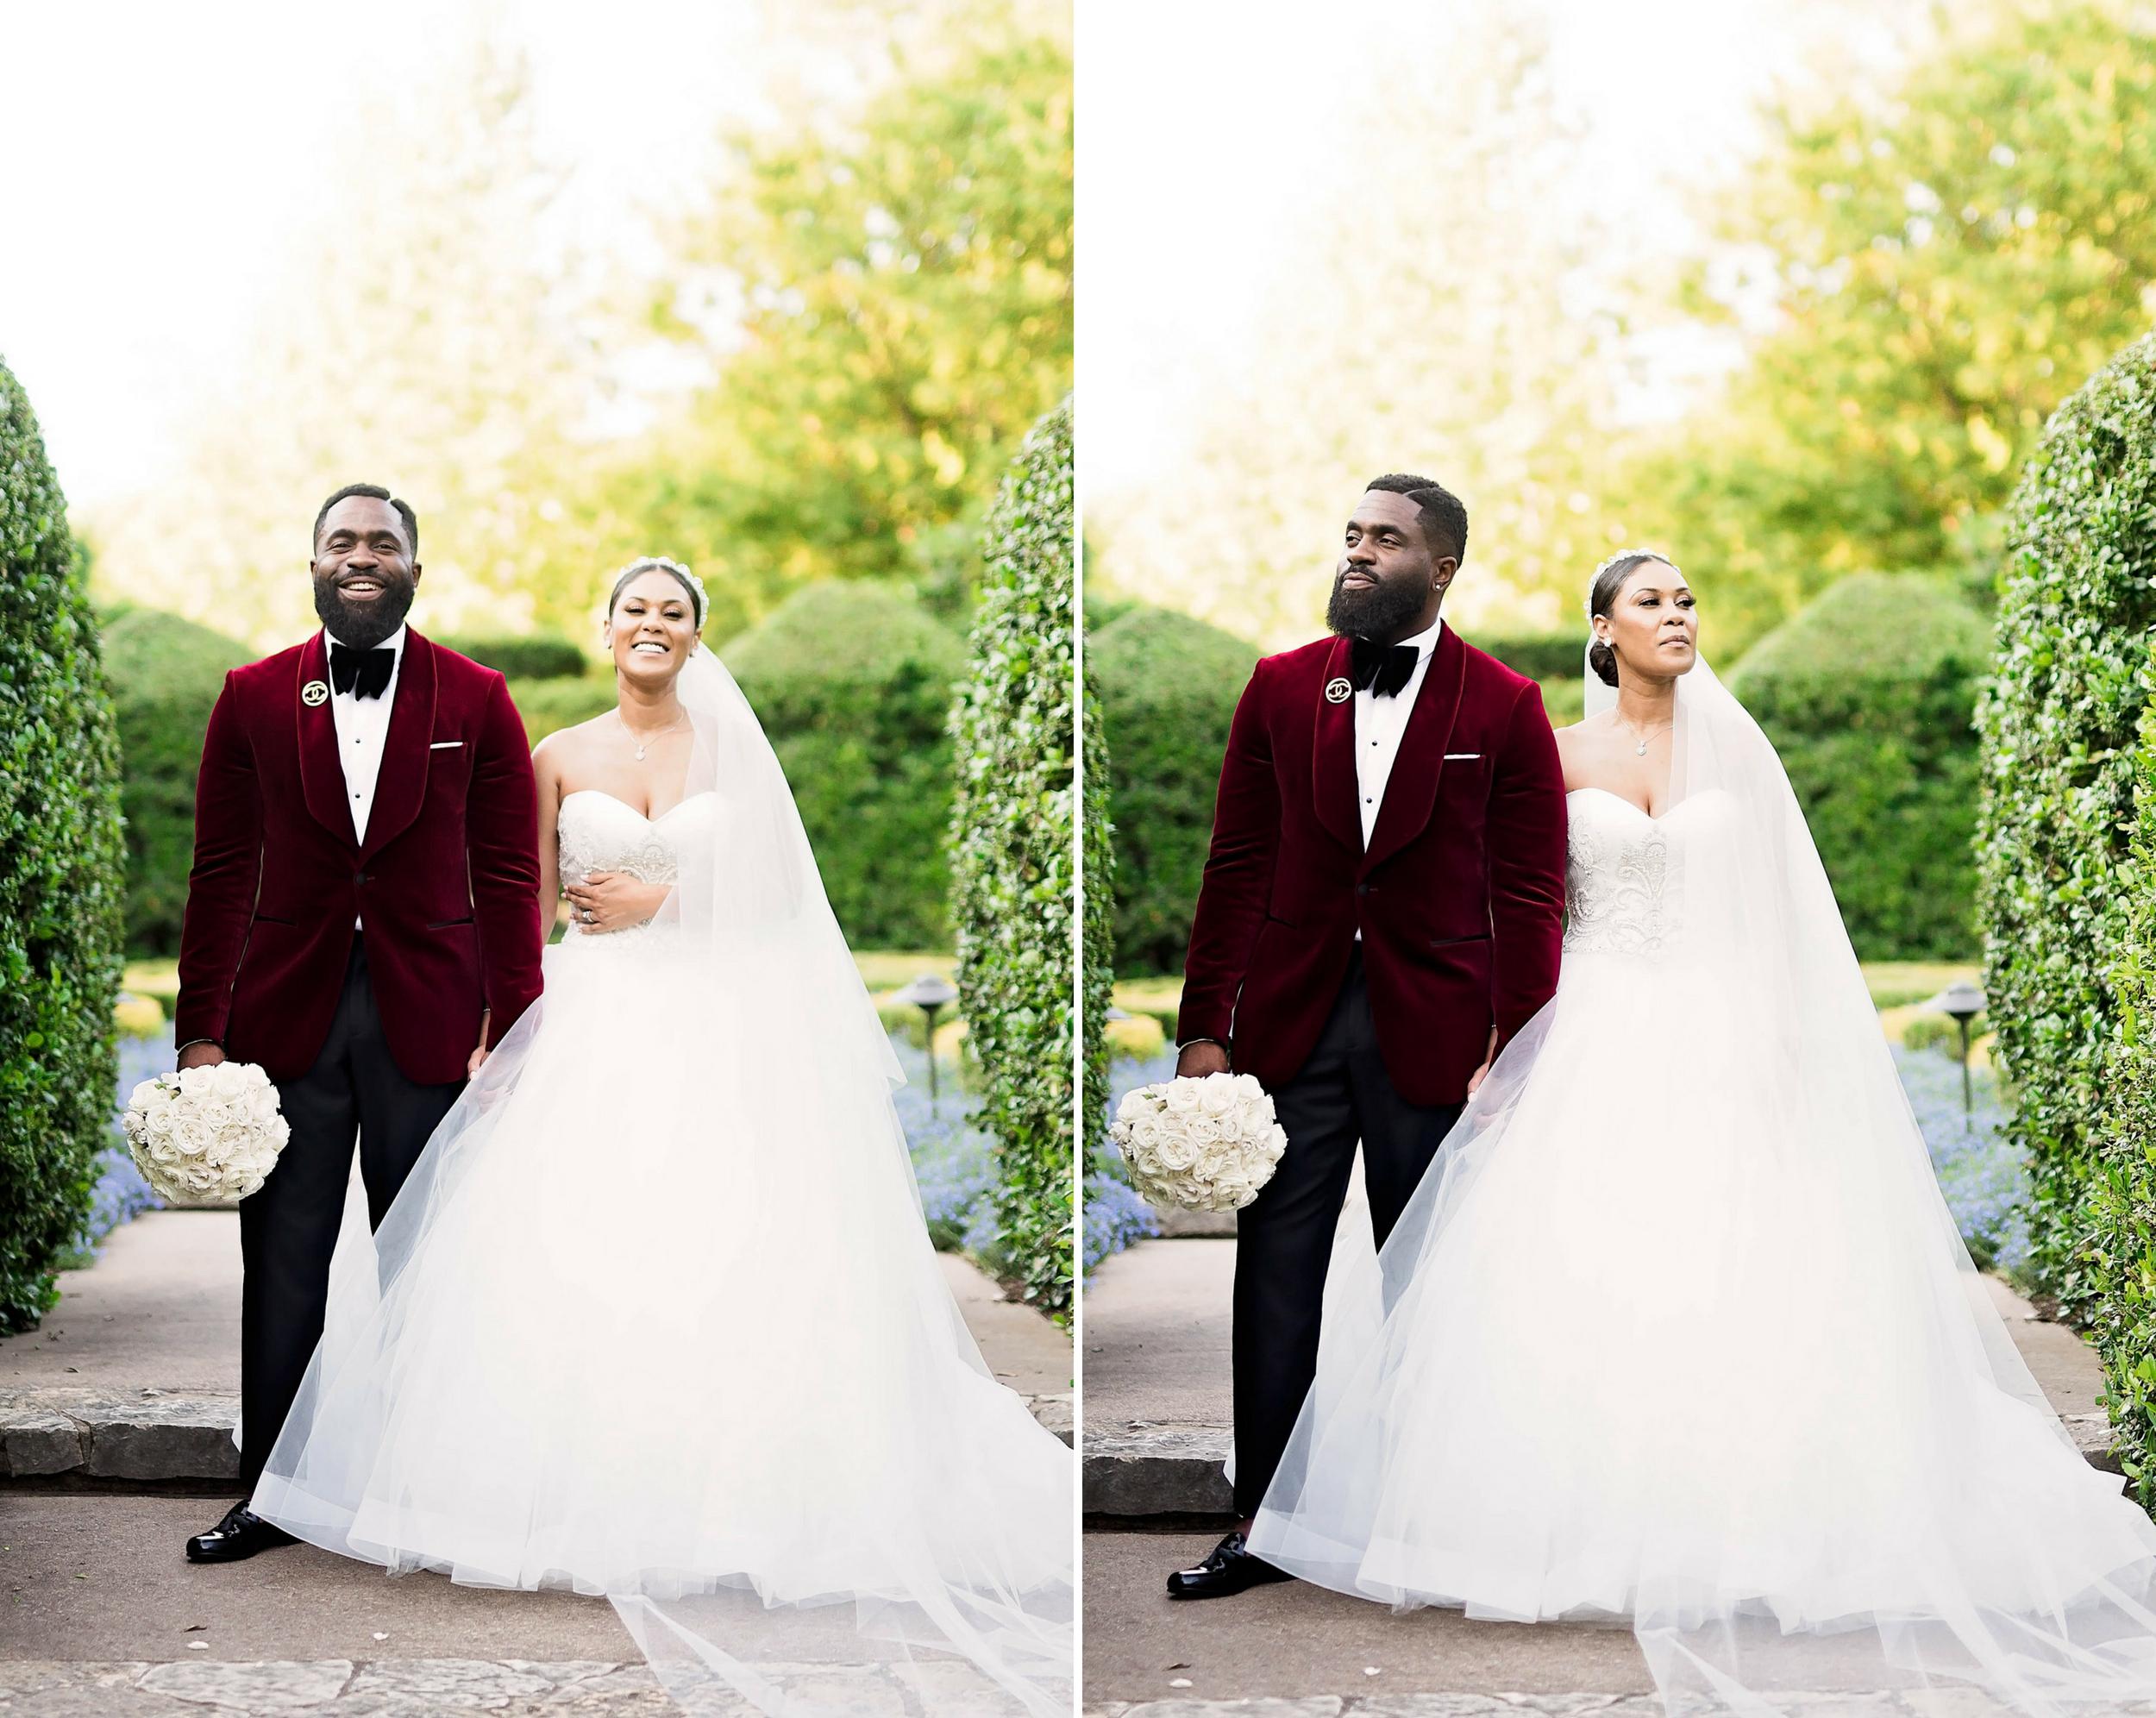 Kerri-Bravion-Wedding-PharrisPhotos-3.jpg